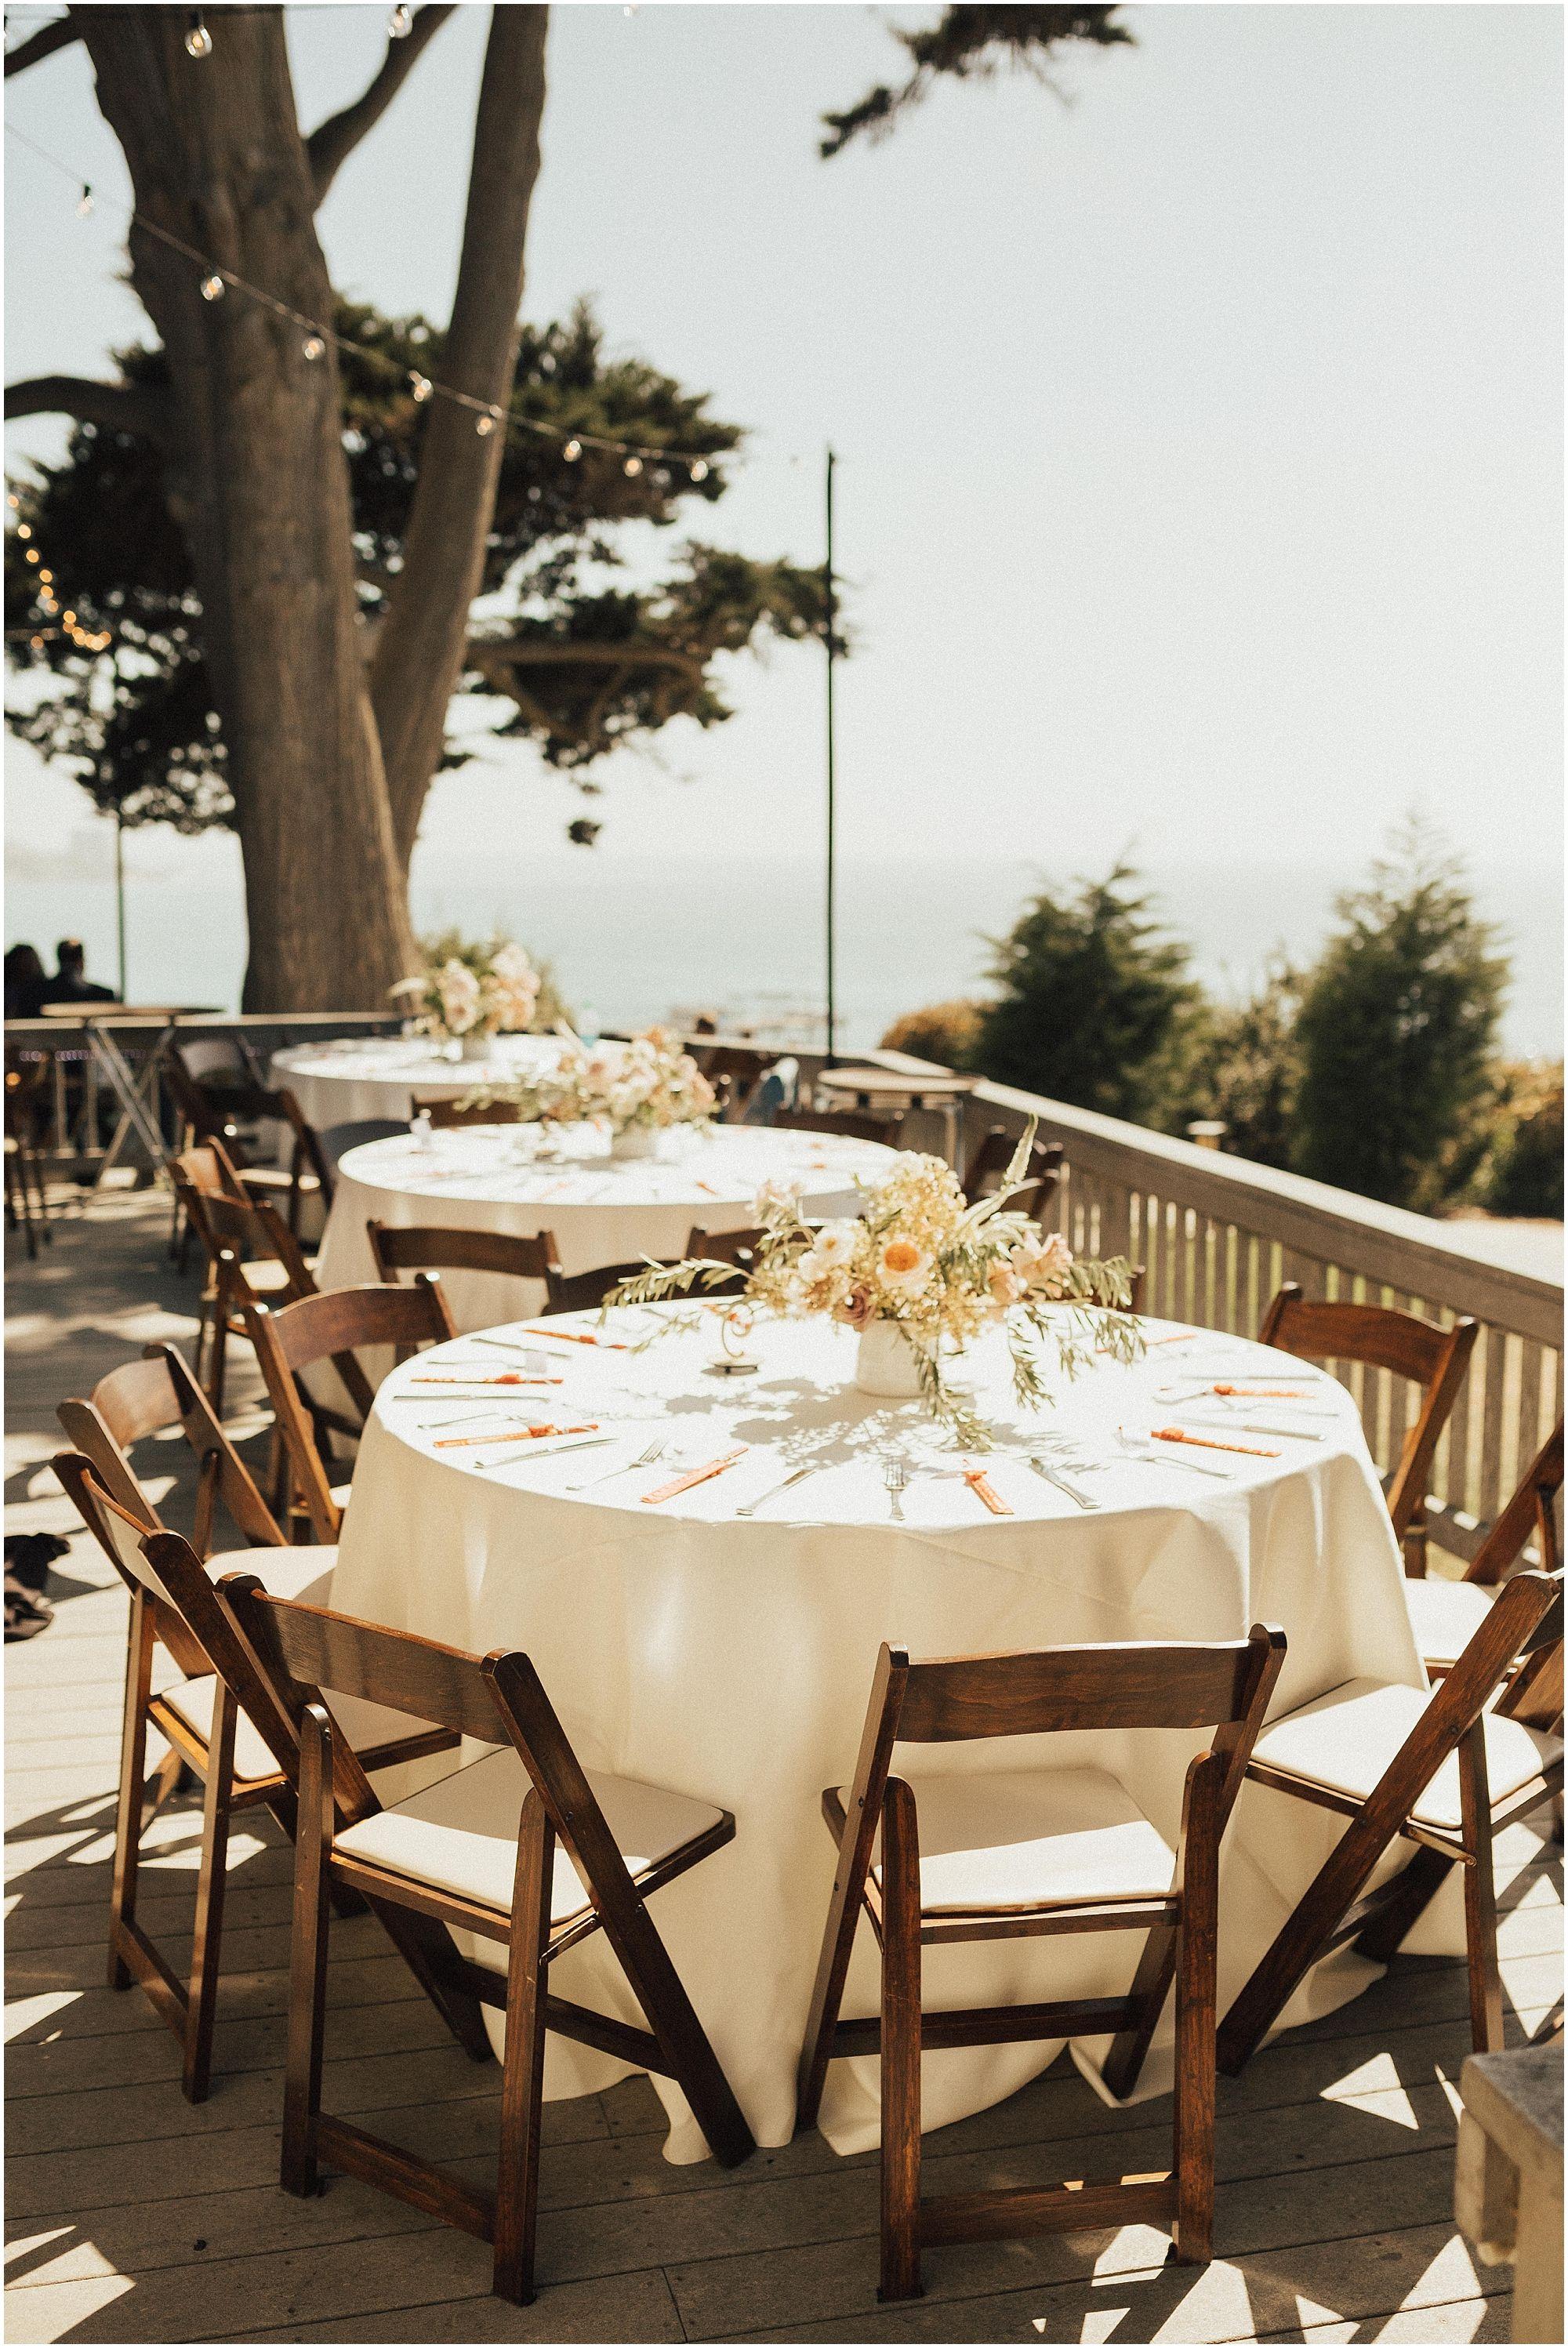 Destination wedding at the martin johnson house in la